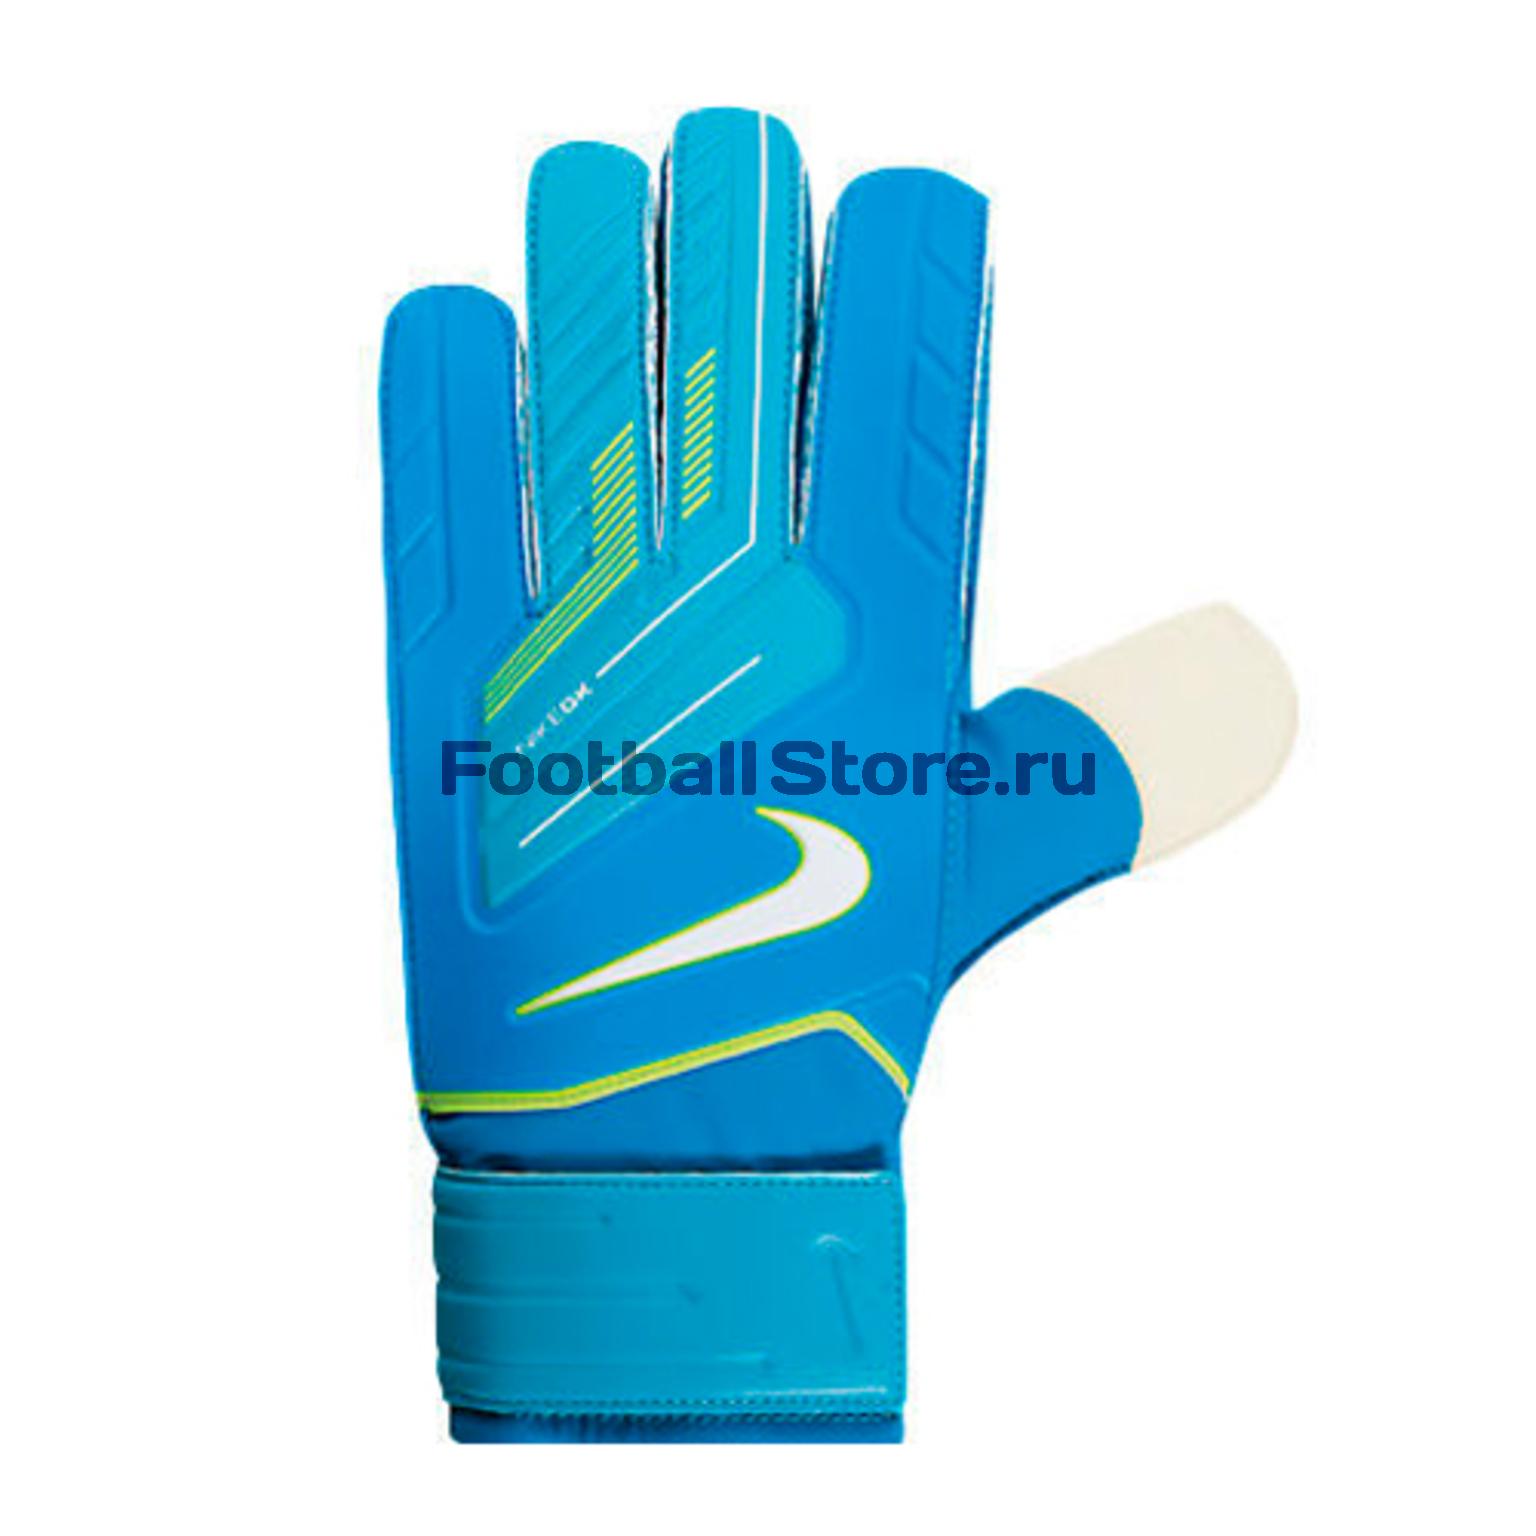 Перчатки Nike Перчатки вратарские Nike GK Classic GS0248-441